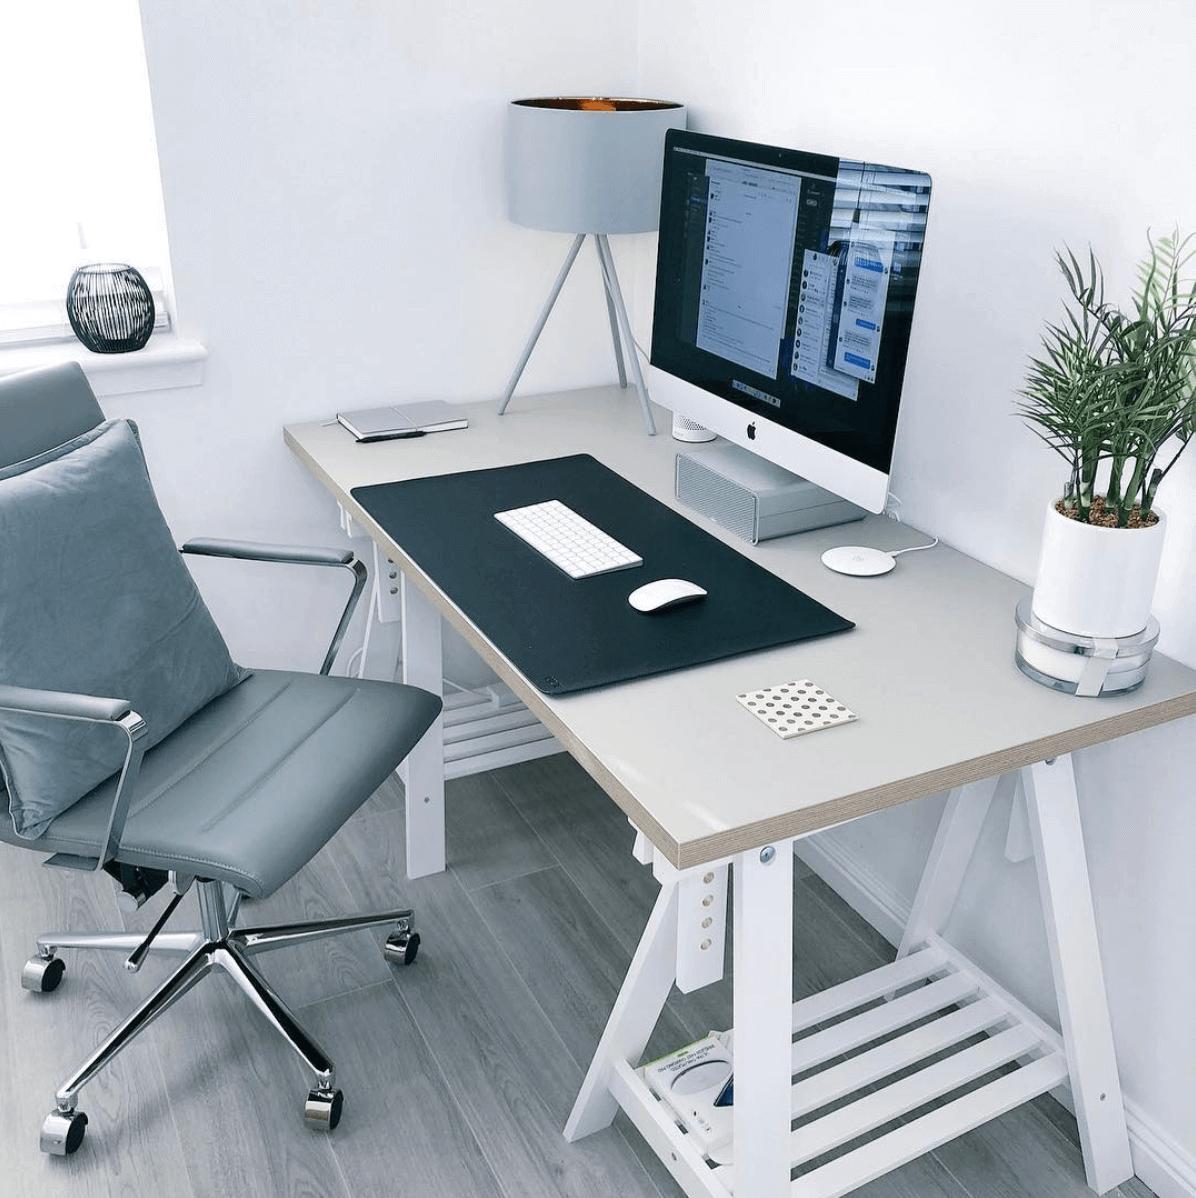 Minimalist Desk Setup By James Mcdonald